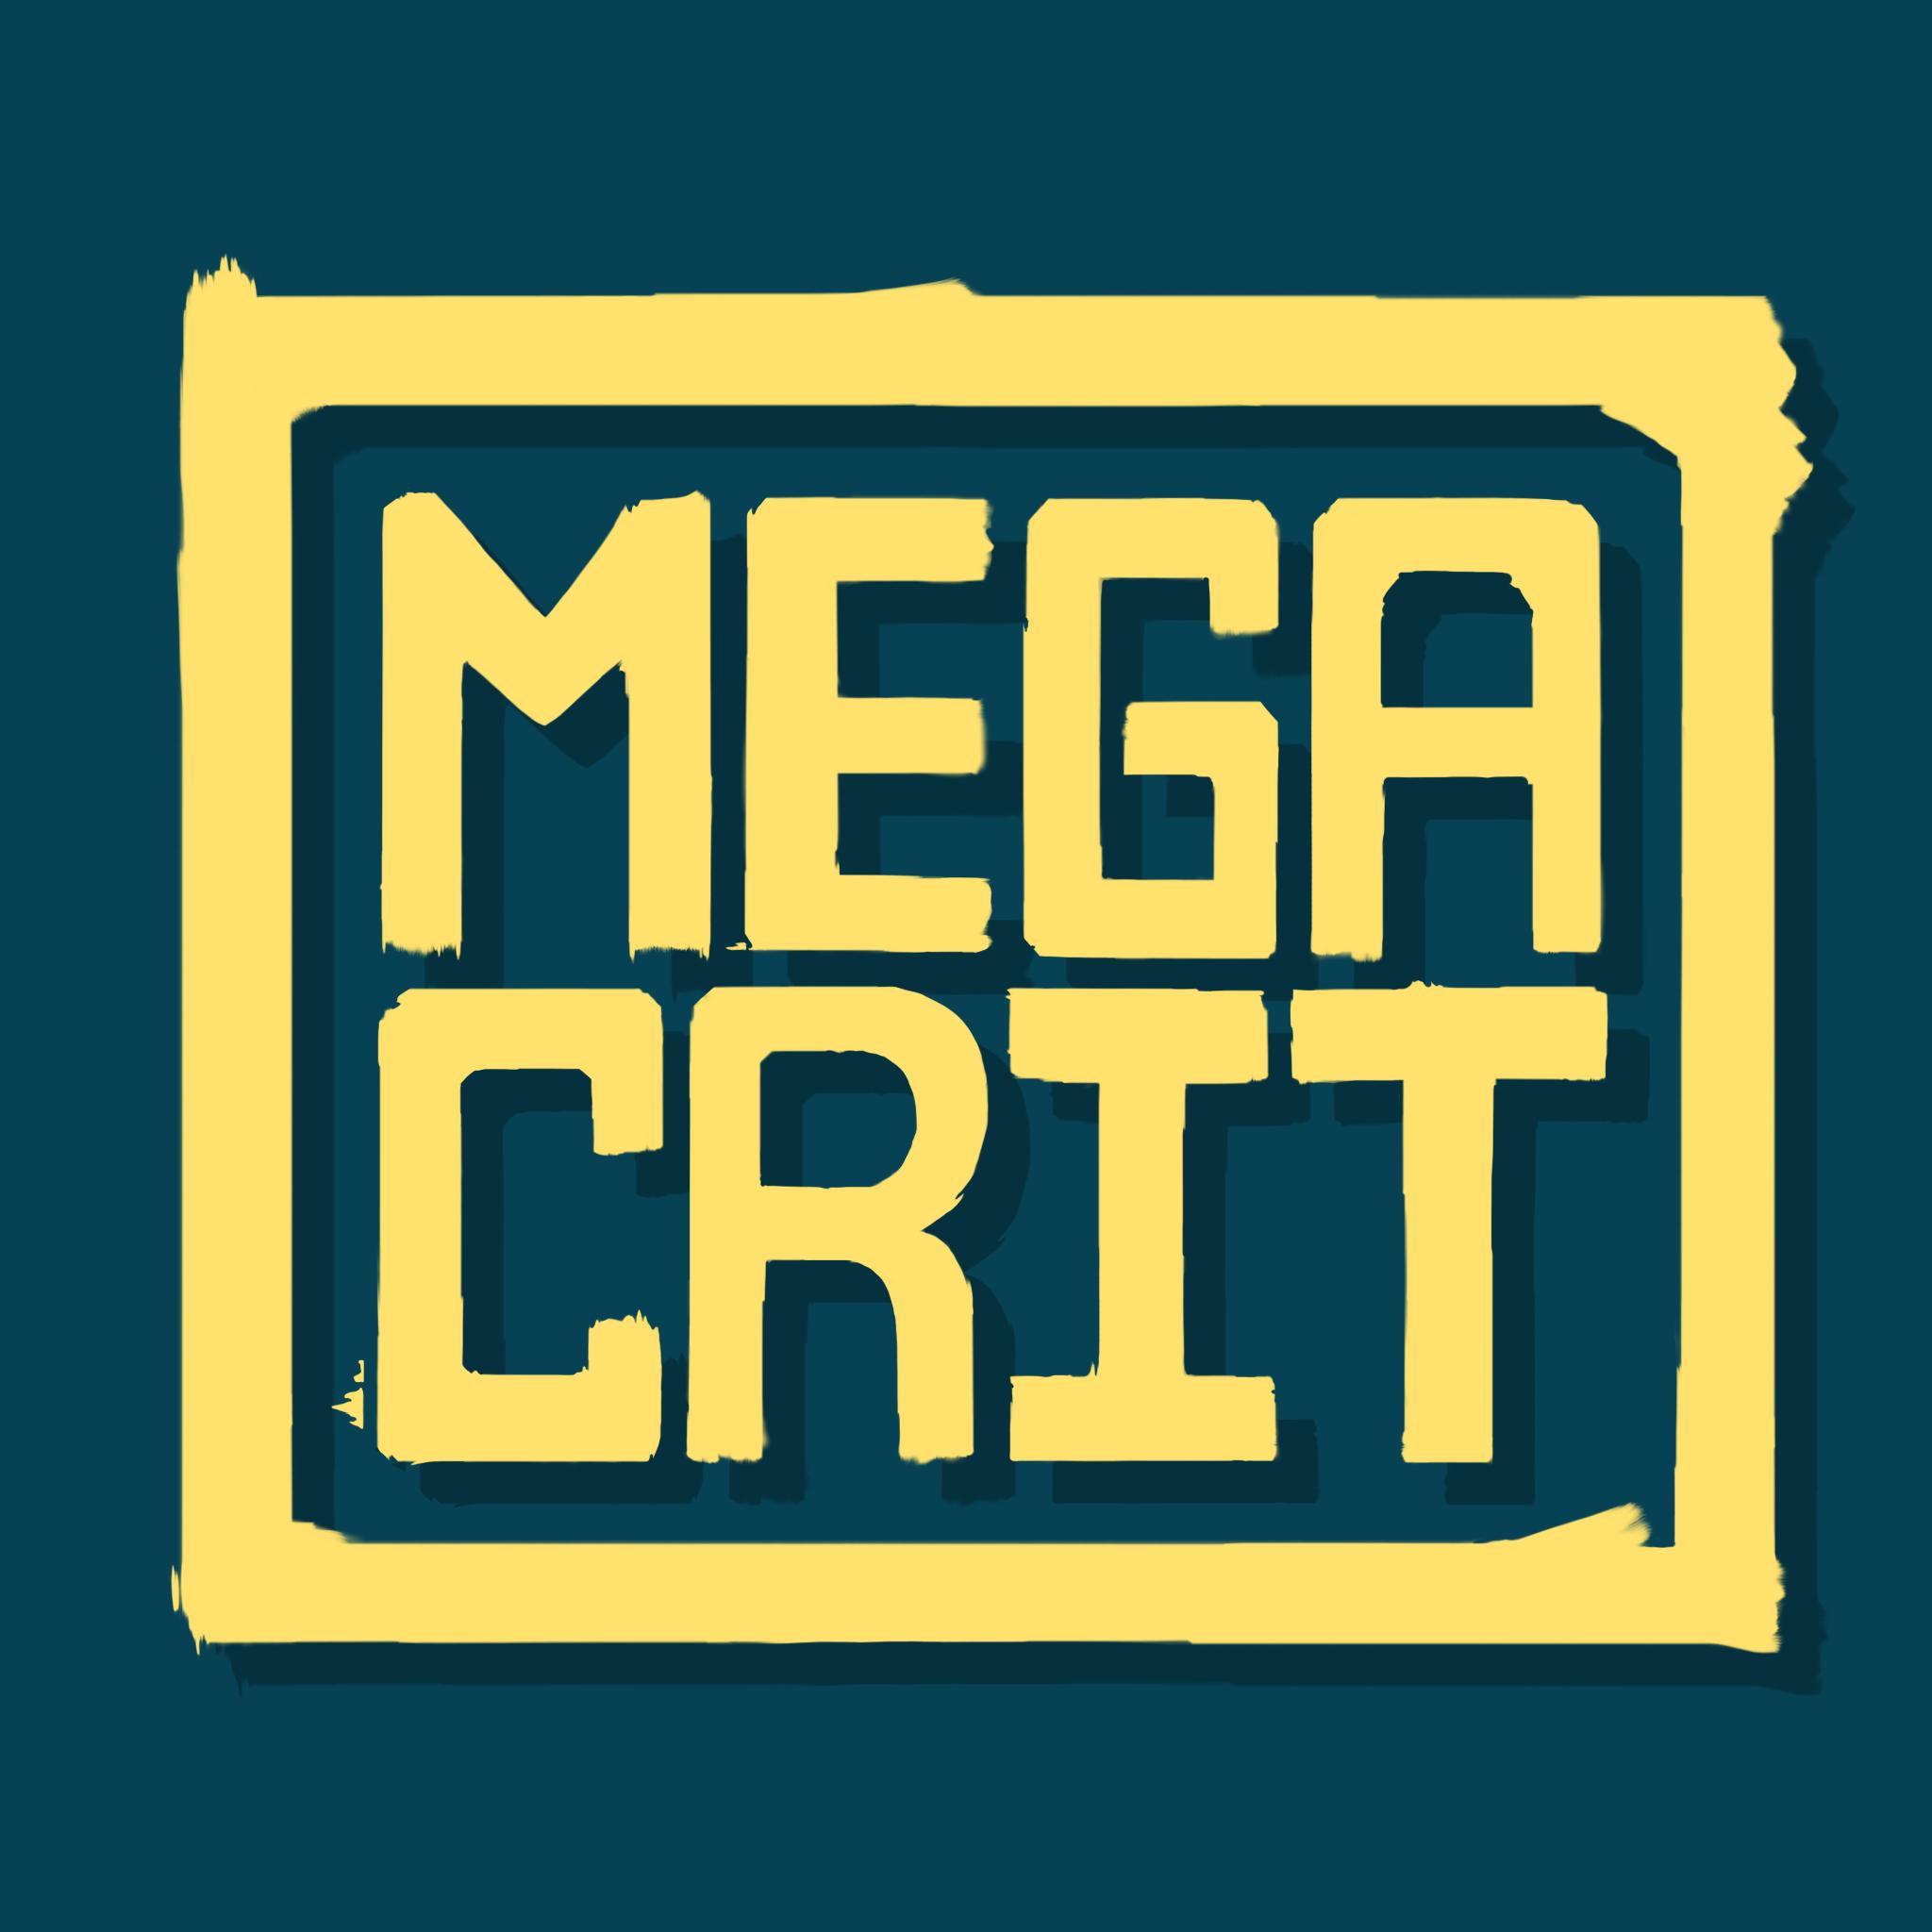 Megacrit